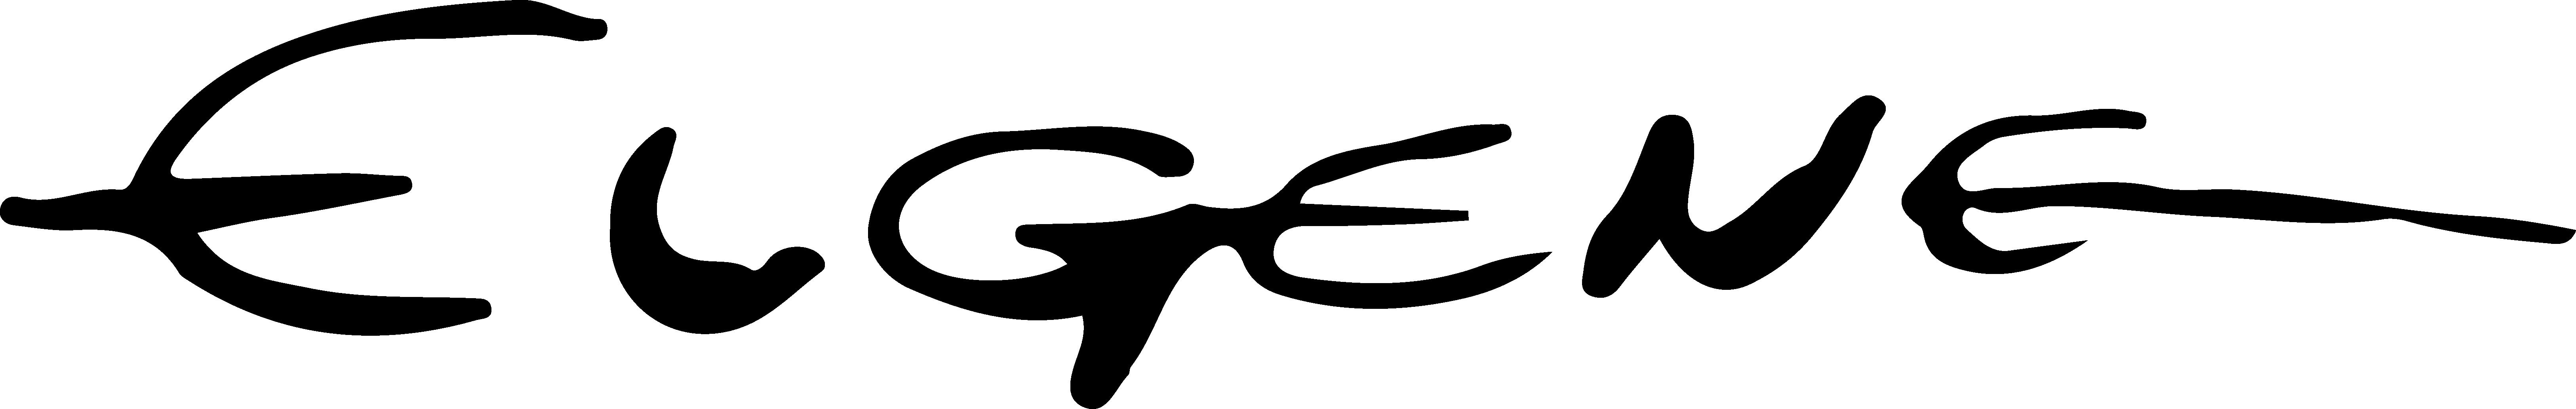 Evgeni Hristov's Signature